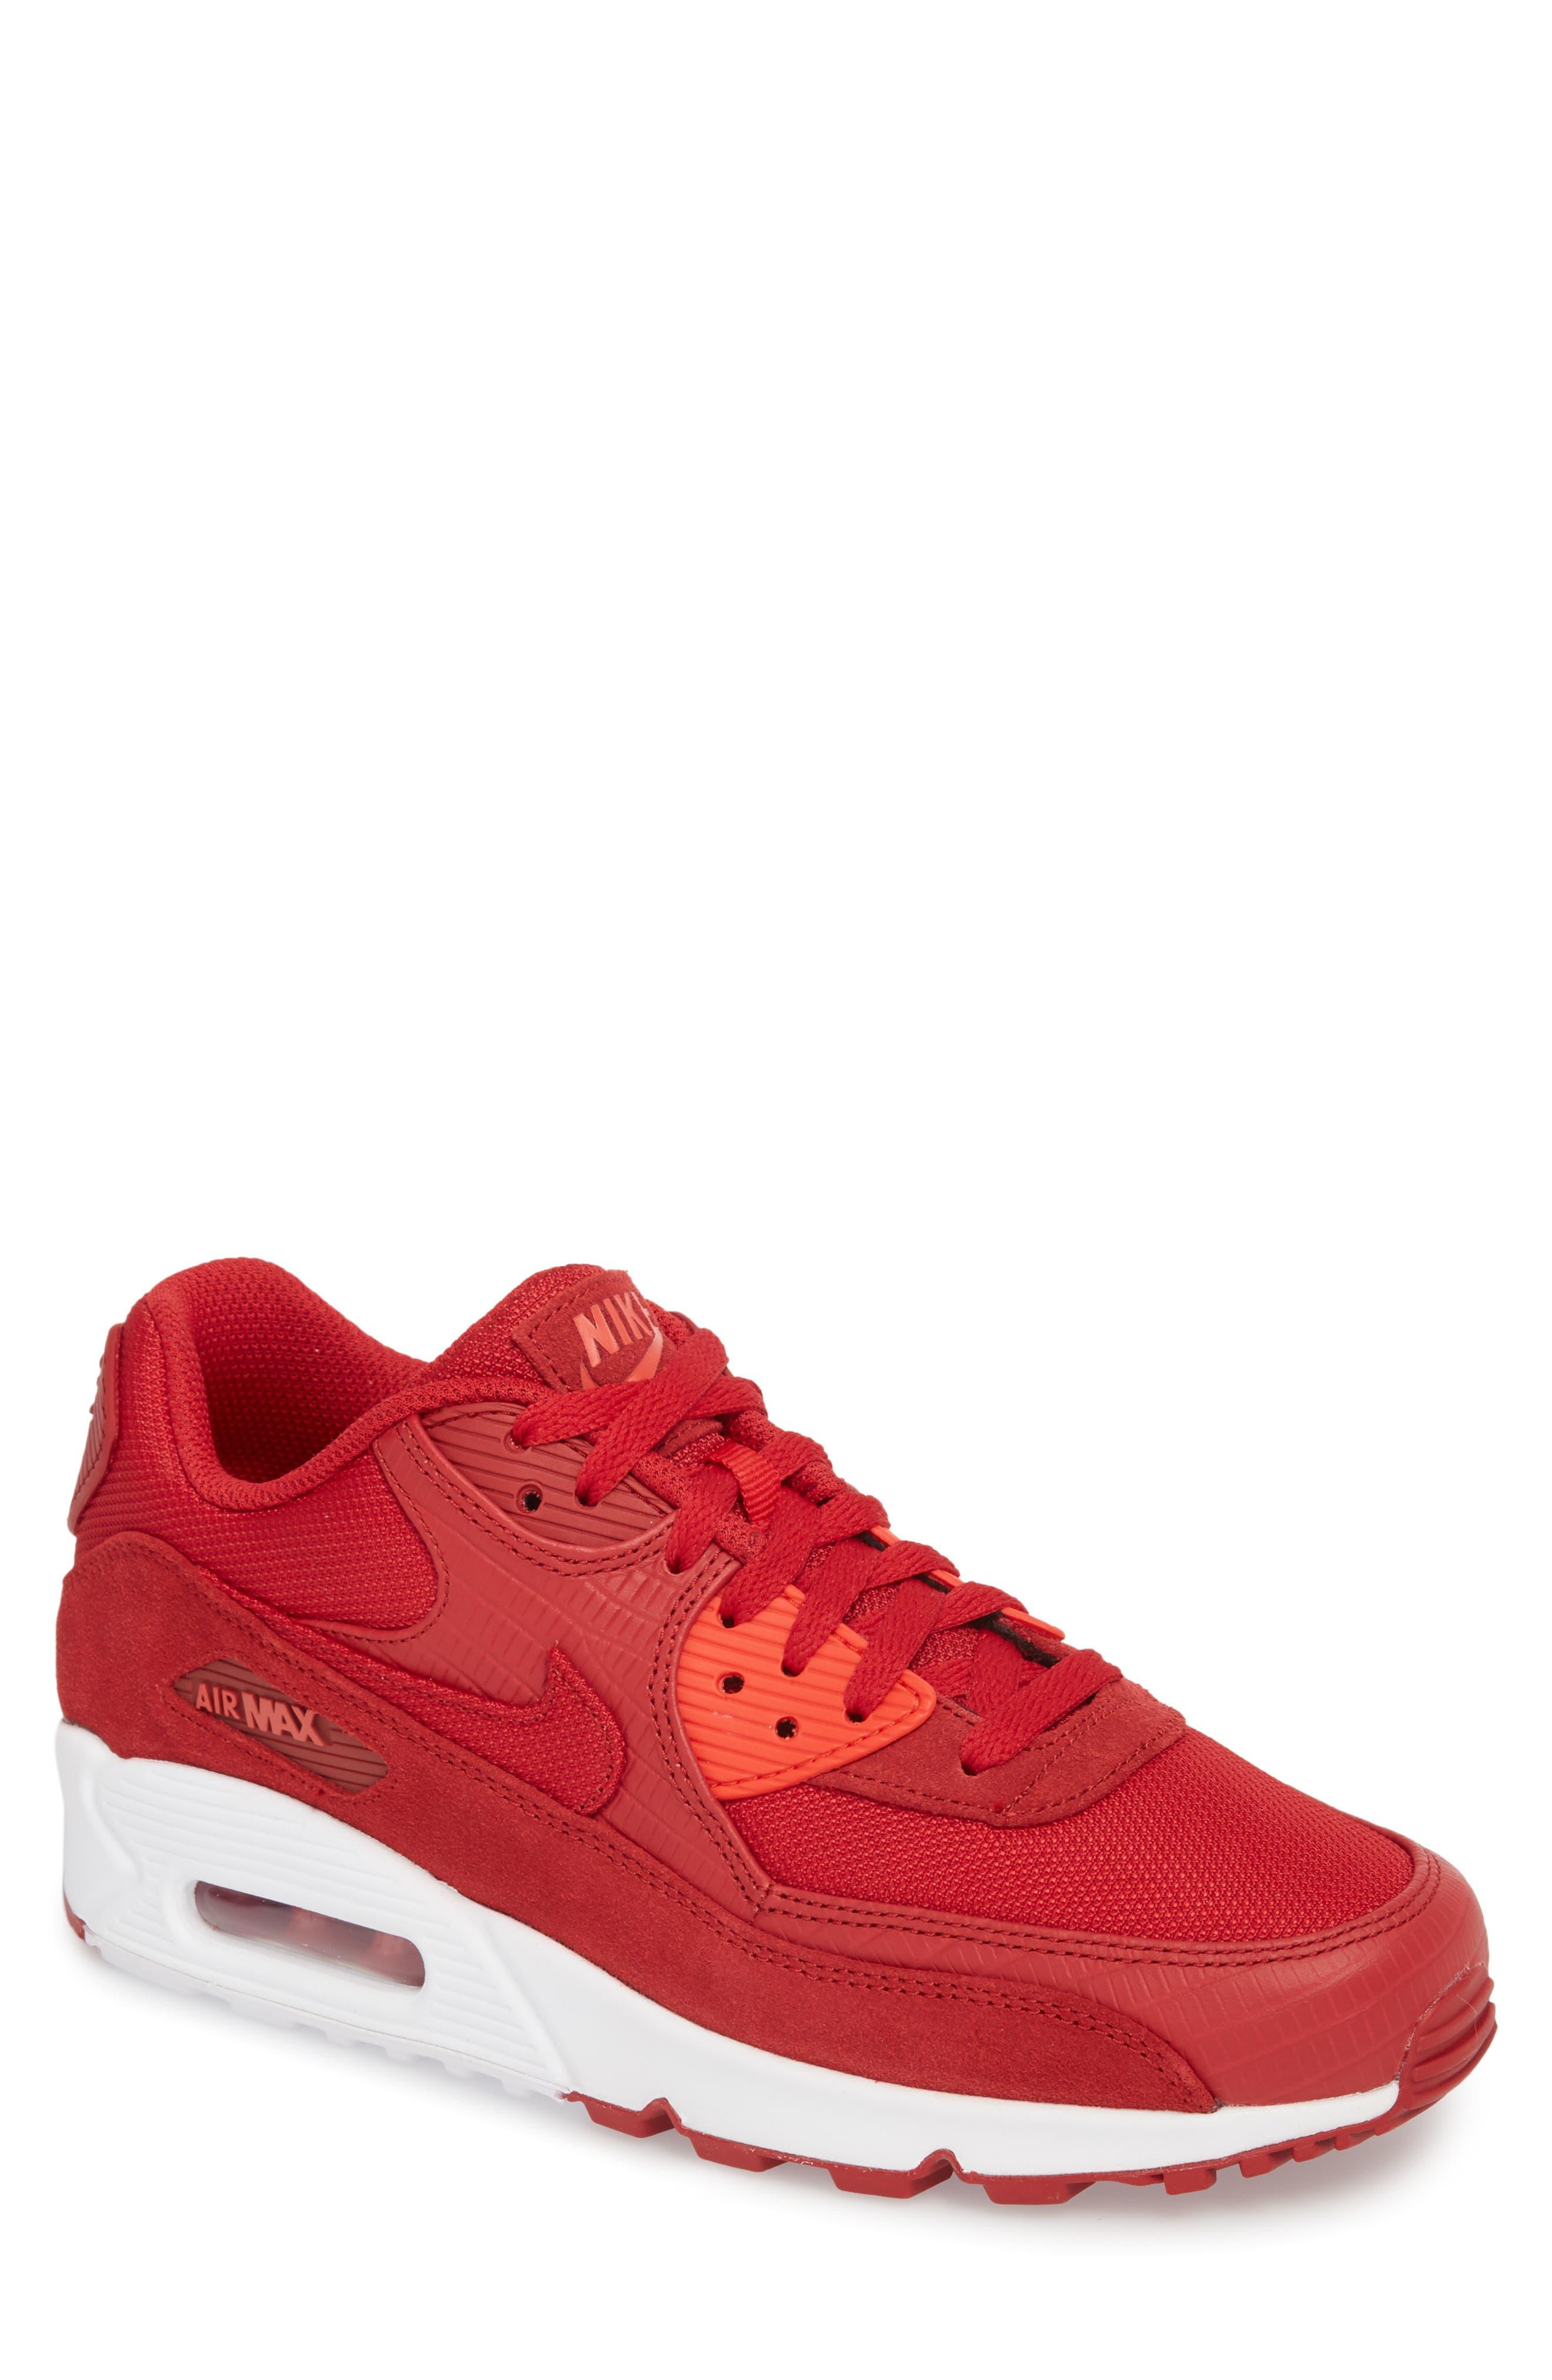 Air Max 90 Premium Sneaker,                         Main,                         color, Gym Red/ White